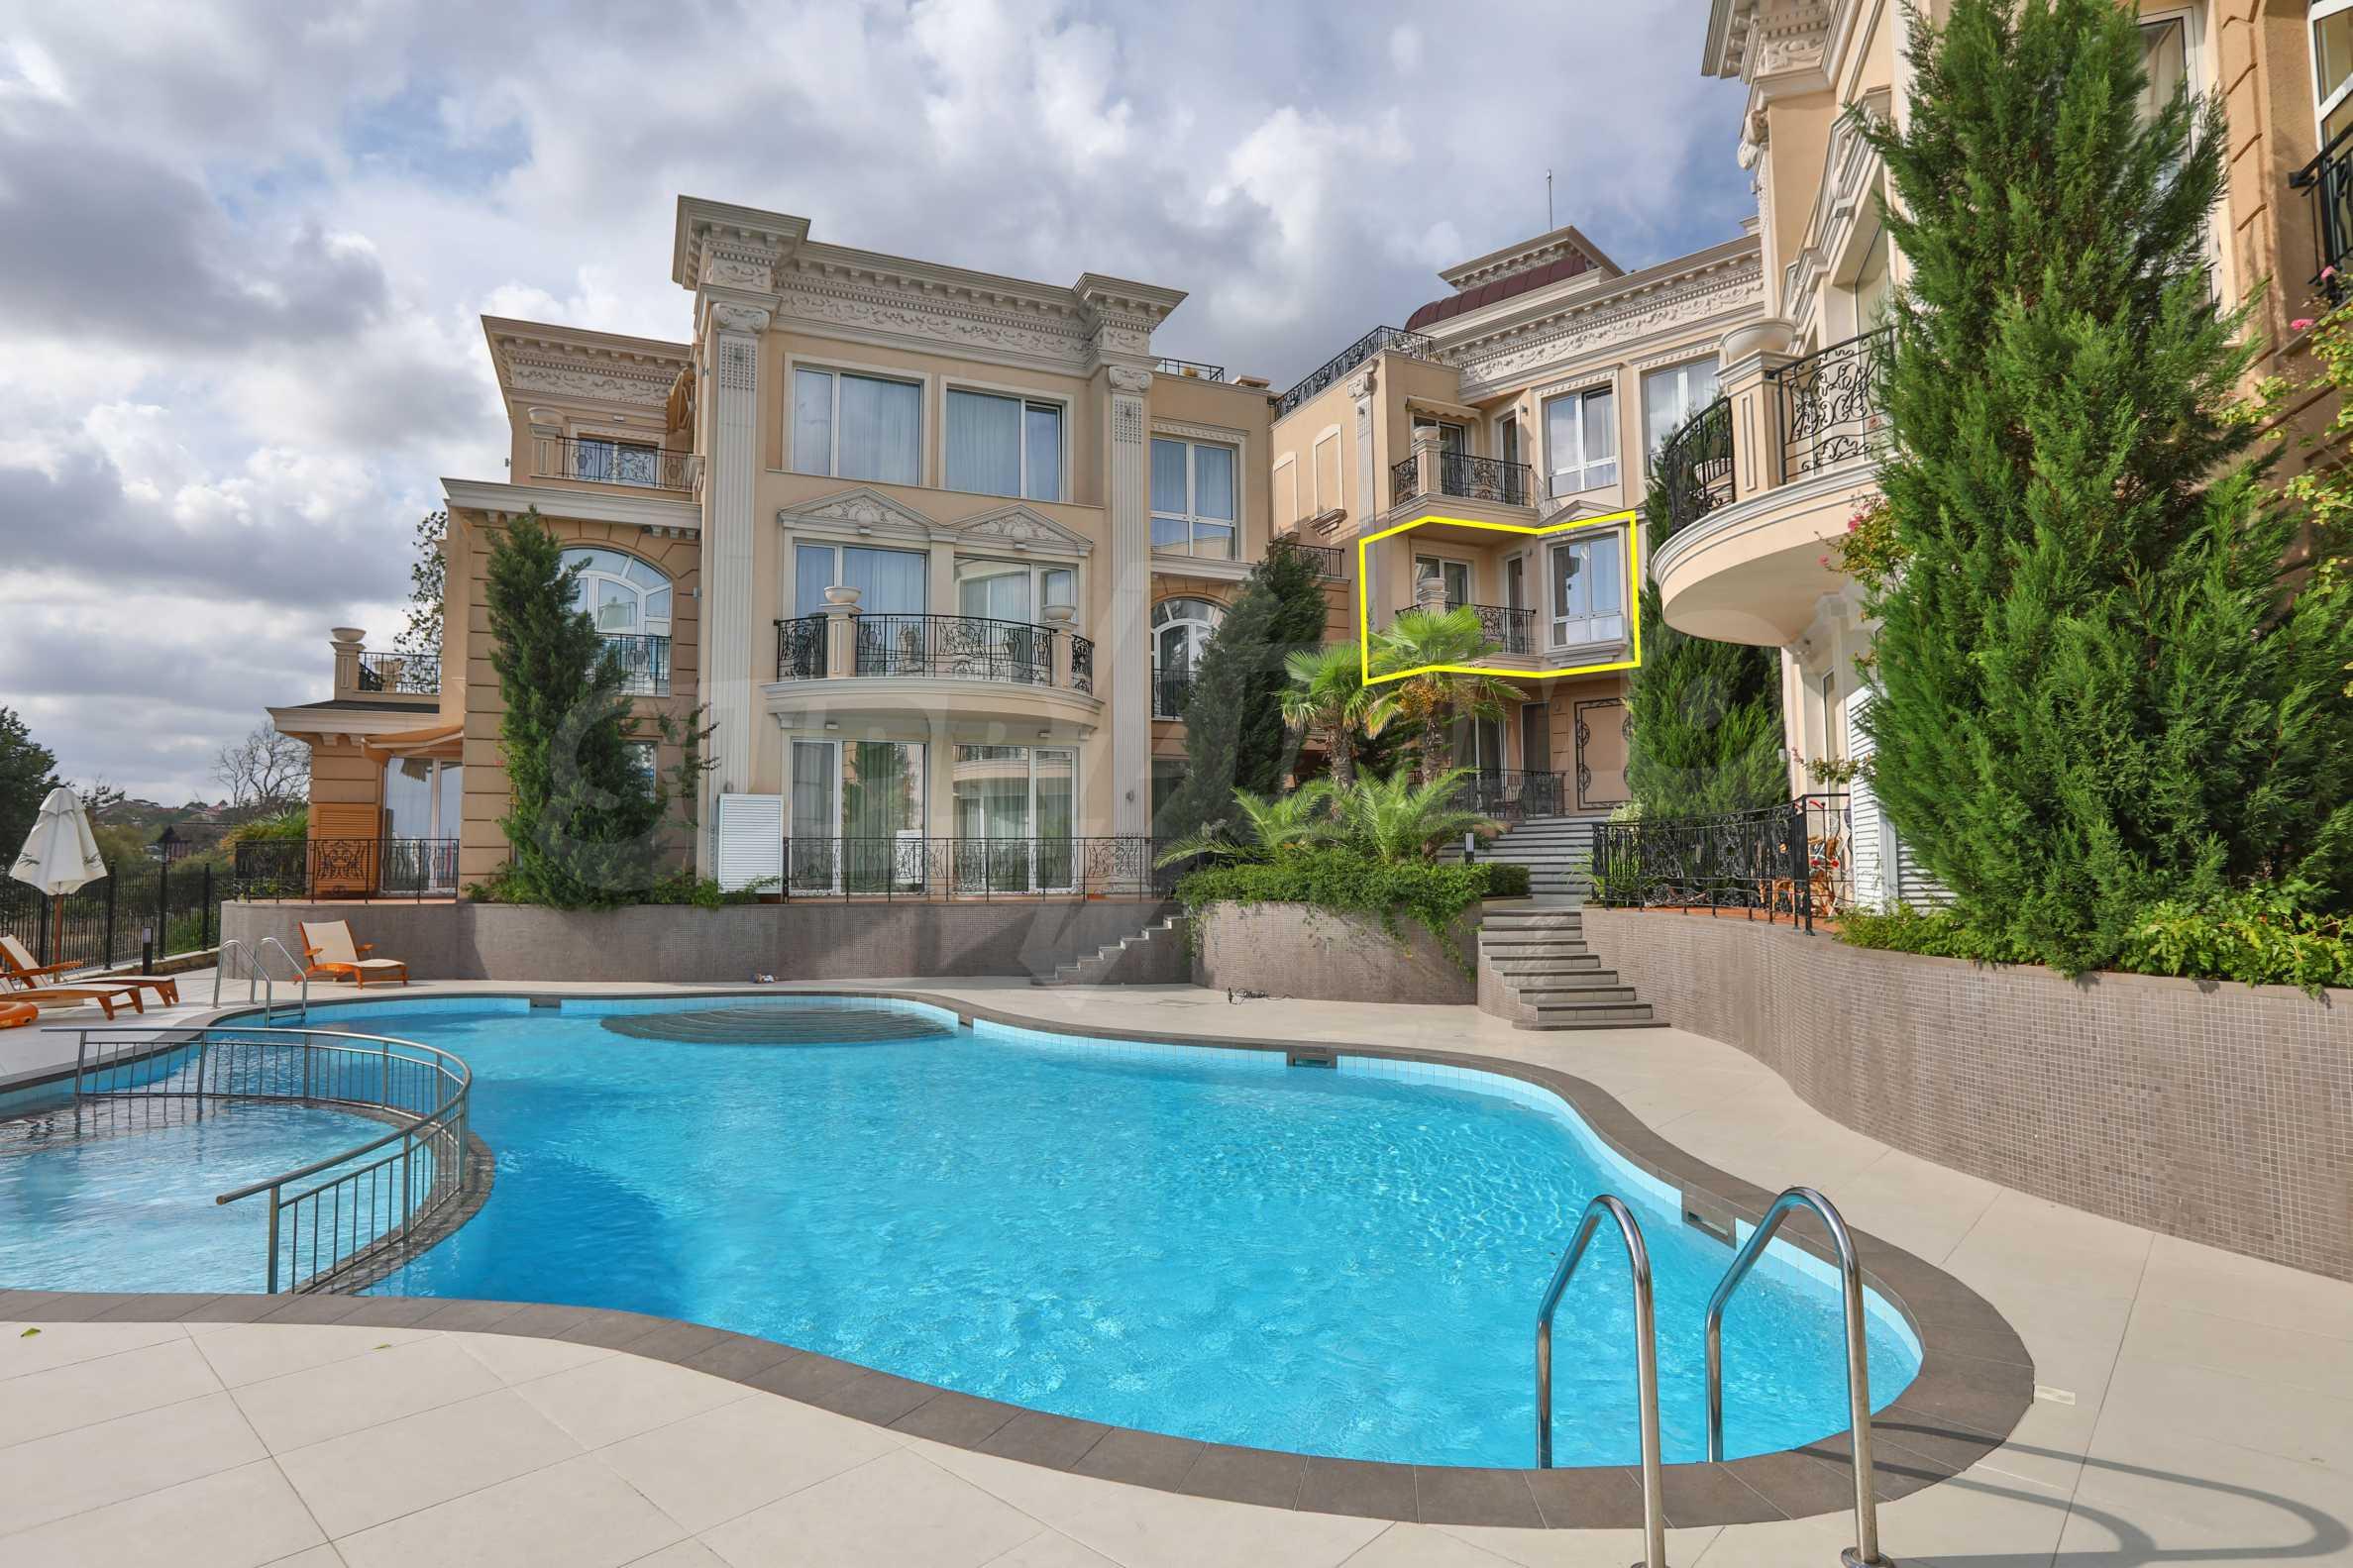 Комфортен двустаен апартамент под наем в Belle Époque Beach Residence, курорт Лозенец 3